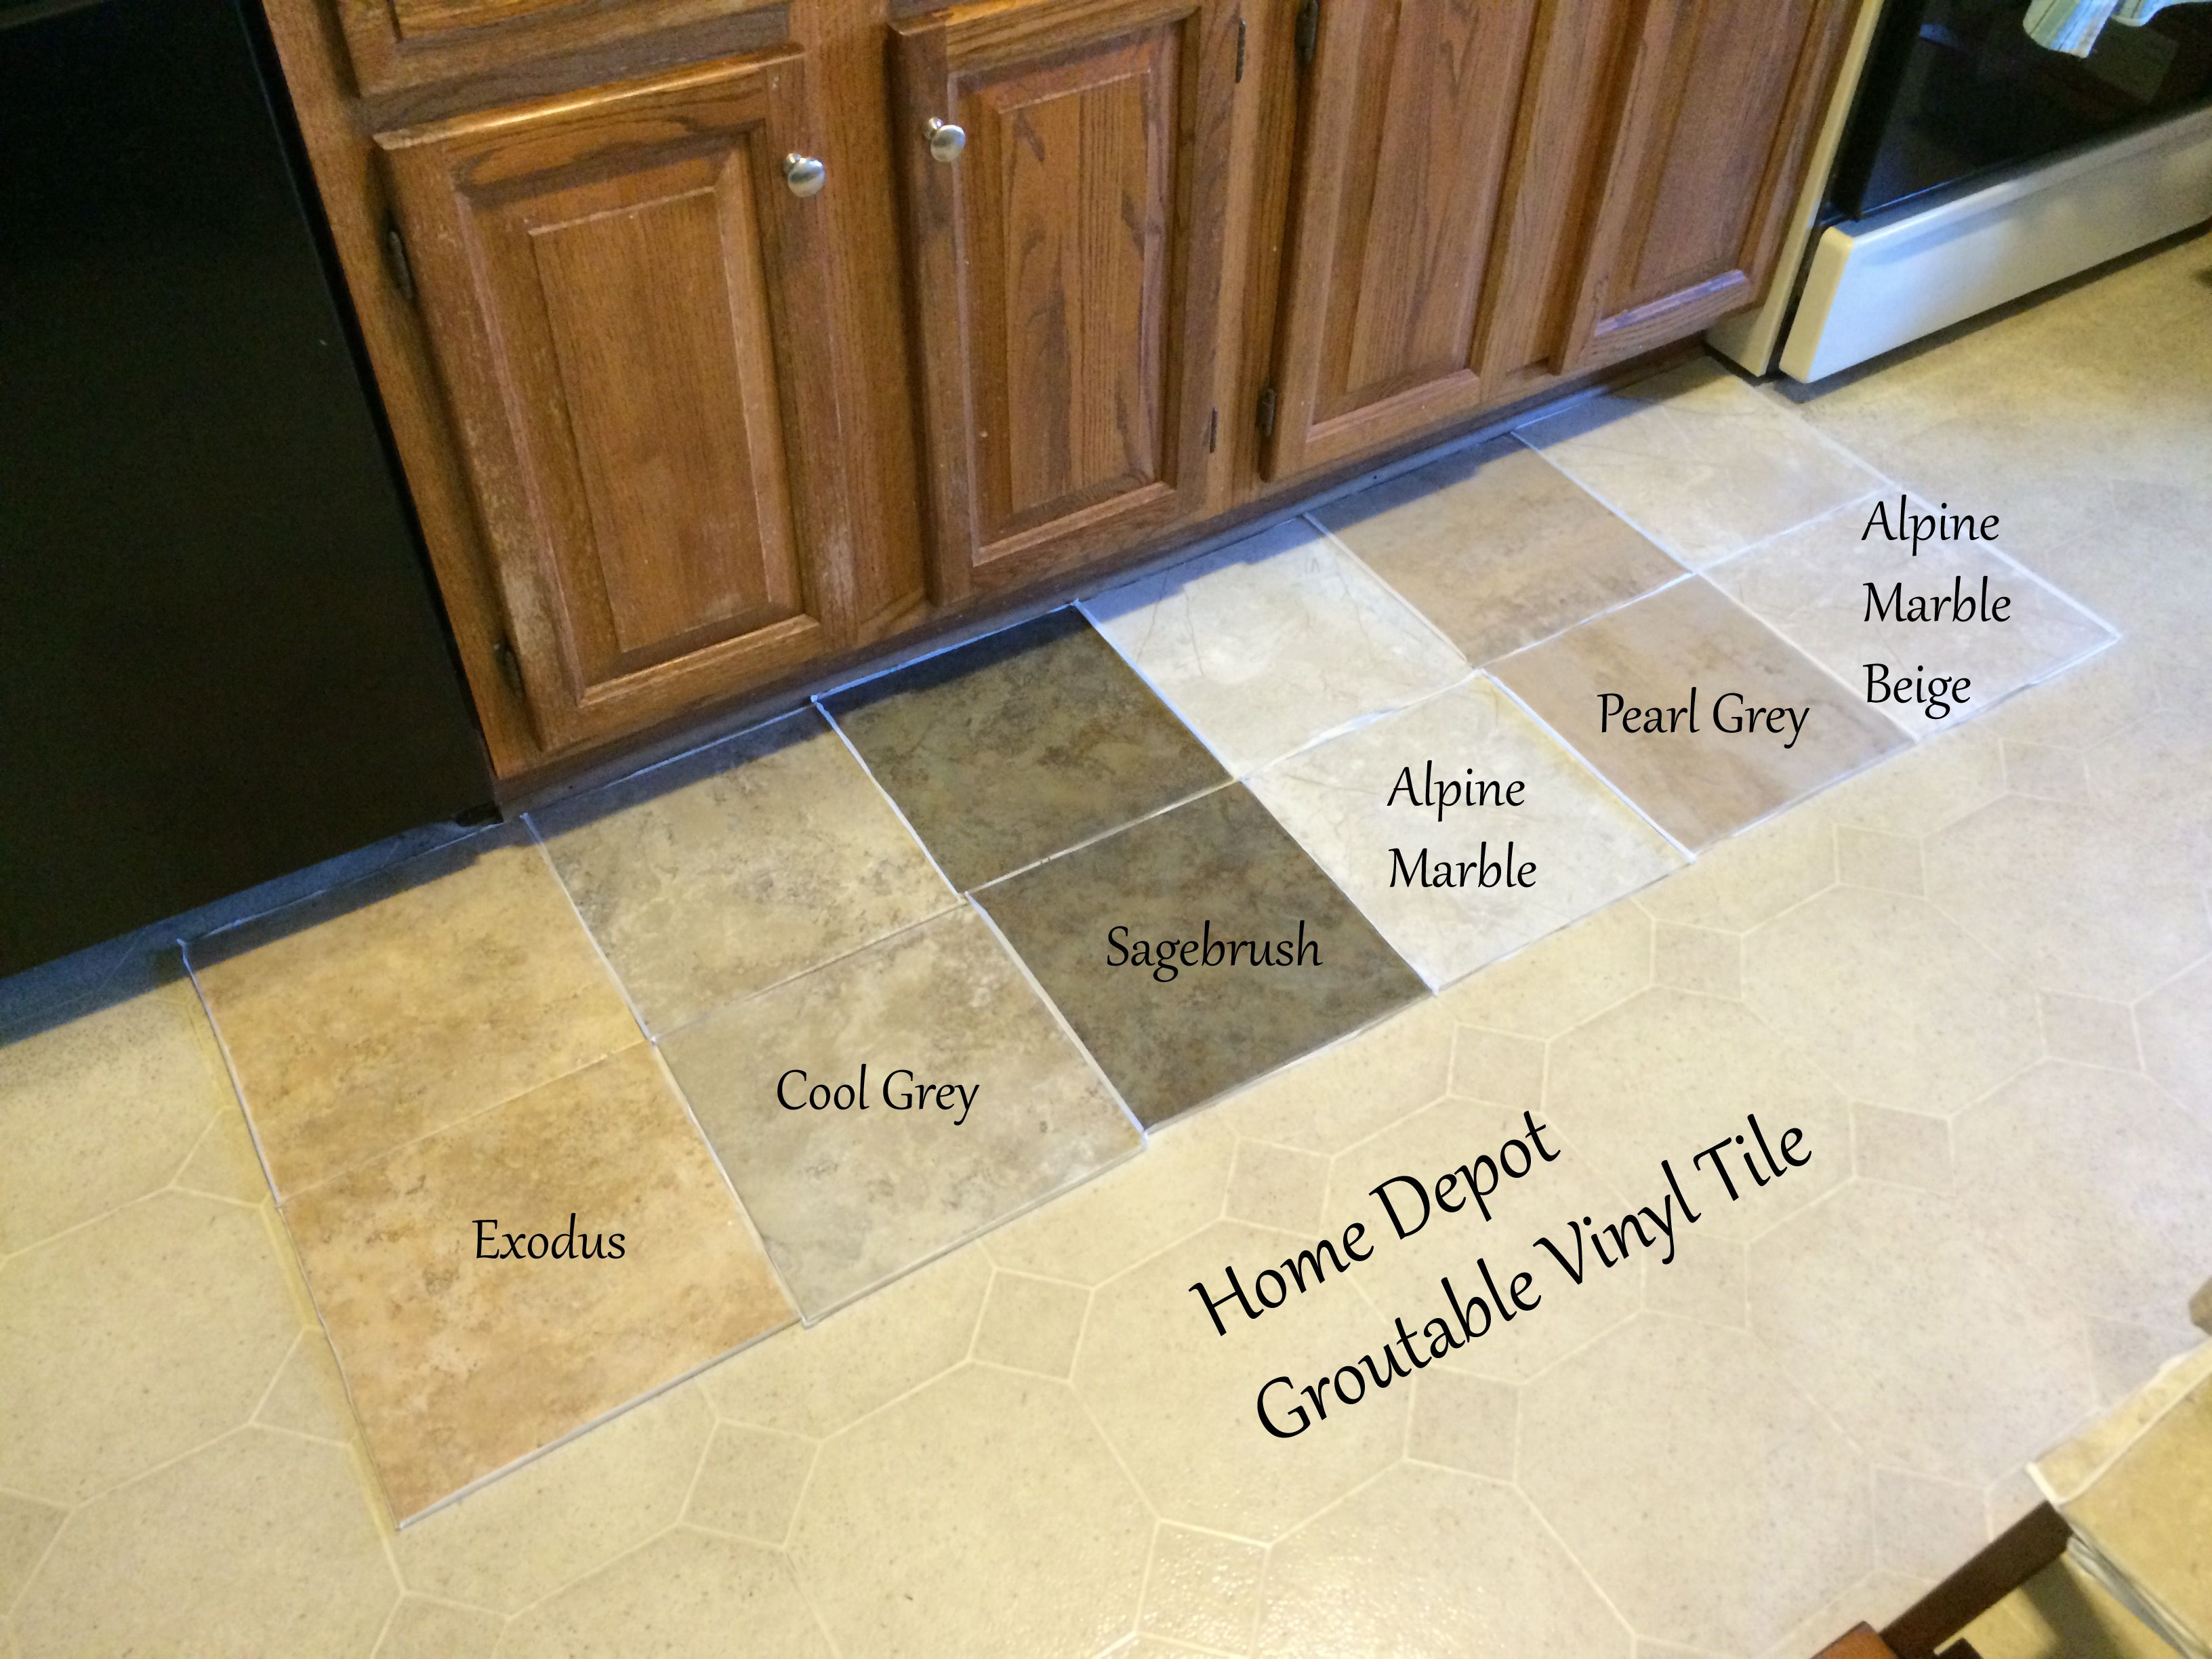 home depot kitchen flooring bridge faucet looking for ideas found groutable vinyl